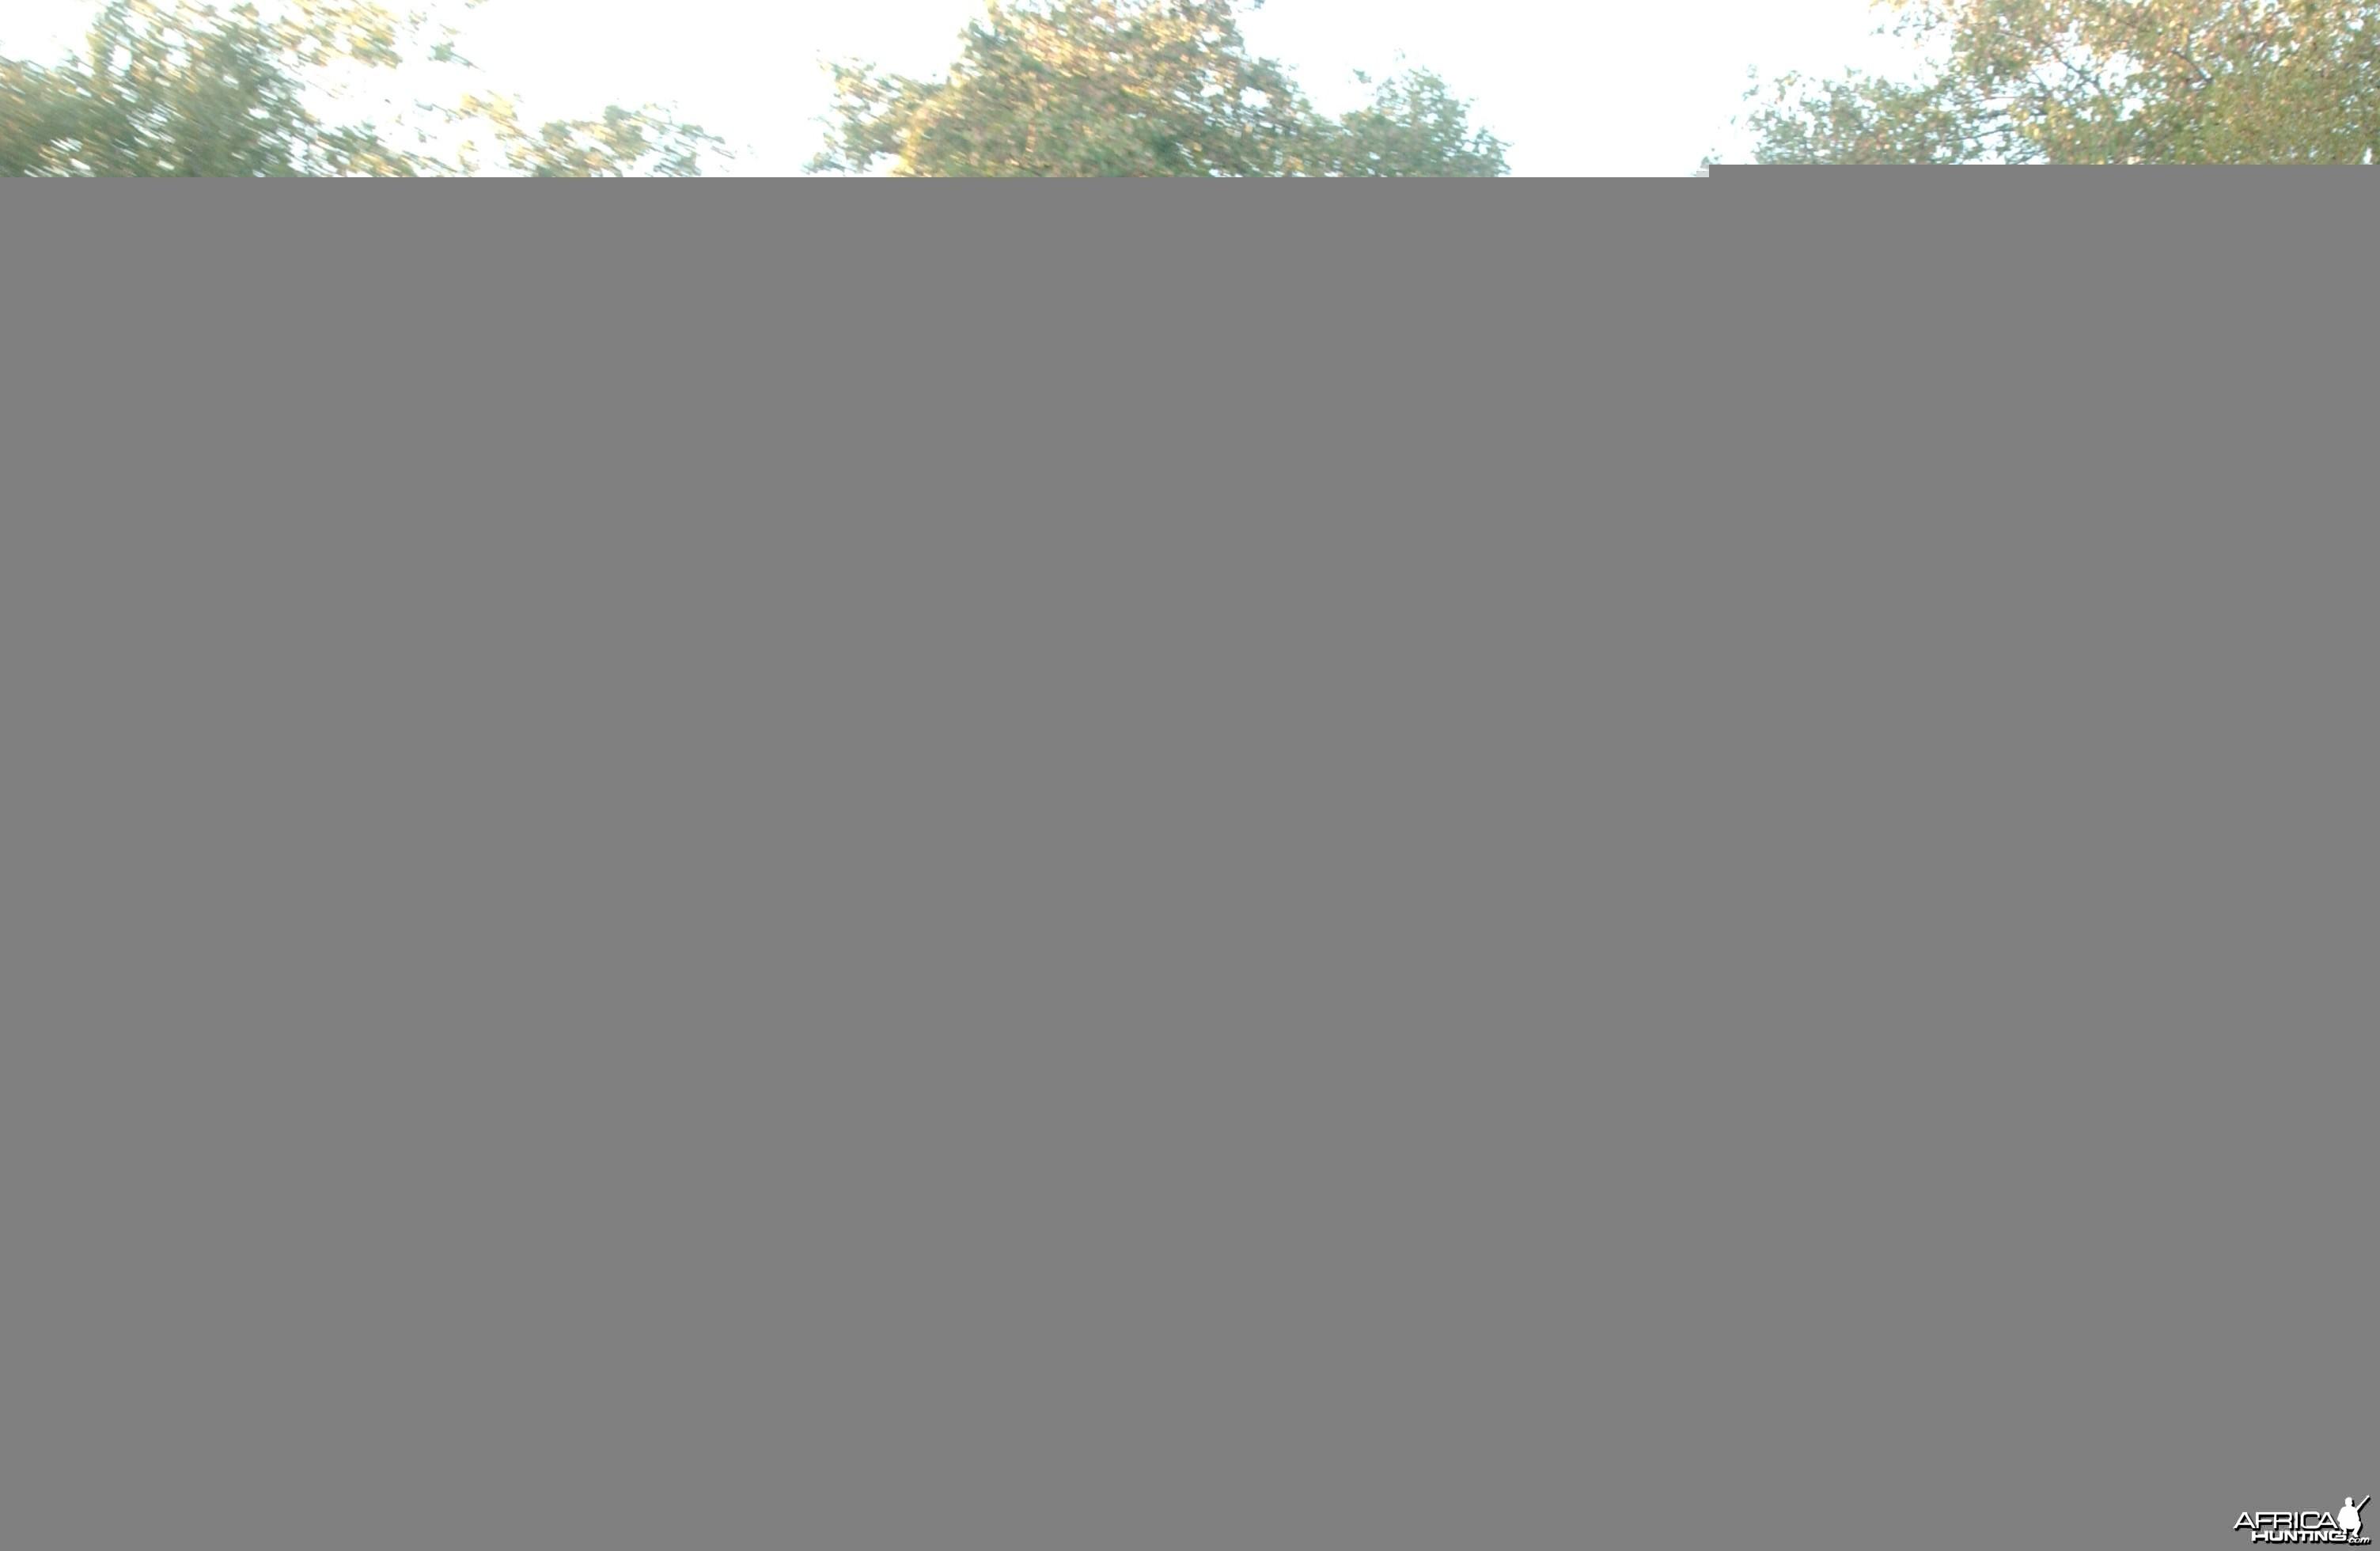 Charging Elephant!